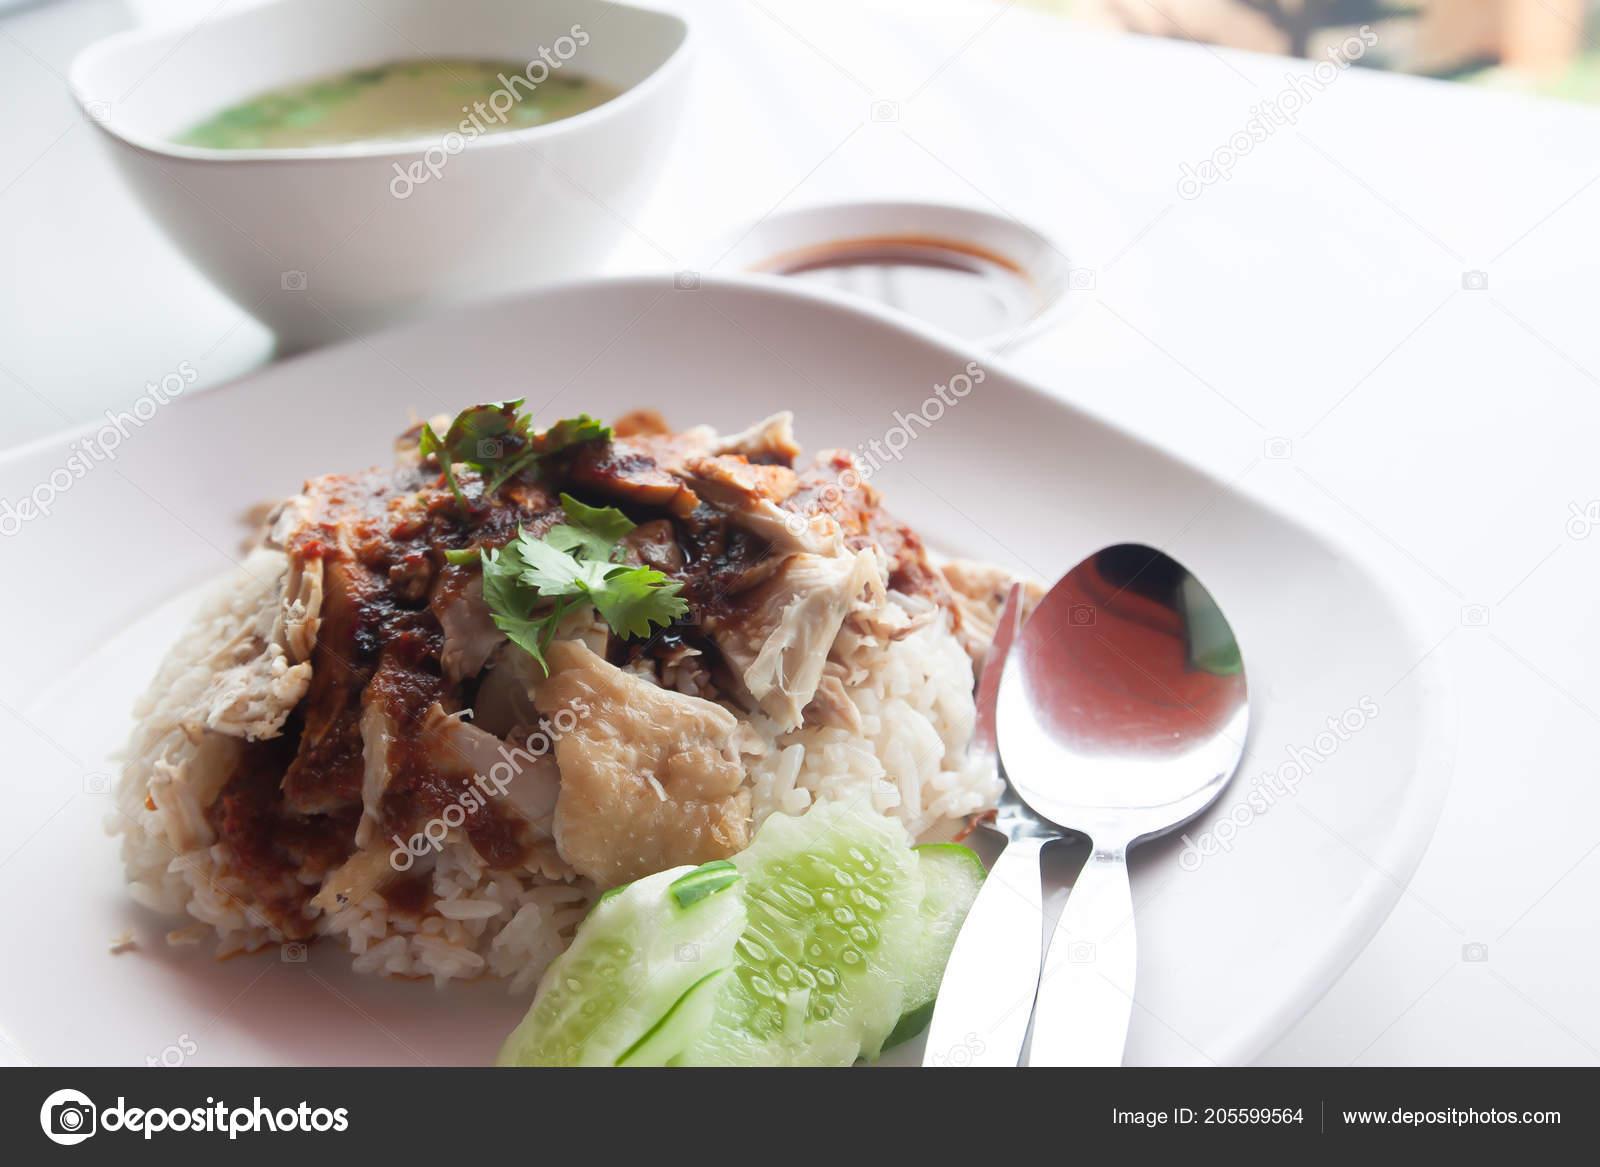 Kiraz Dünyası: Tavuklu Pilav